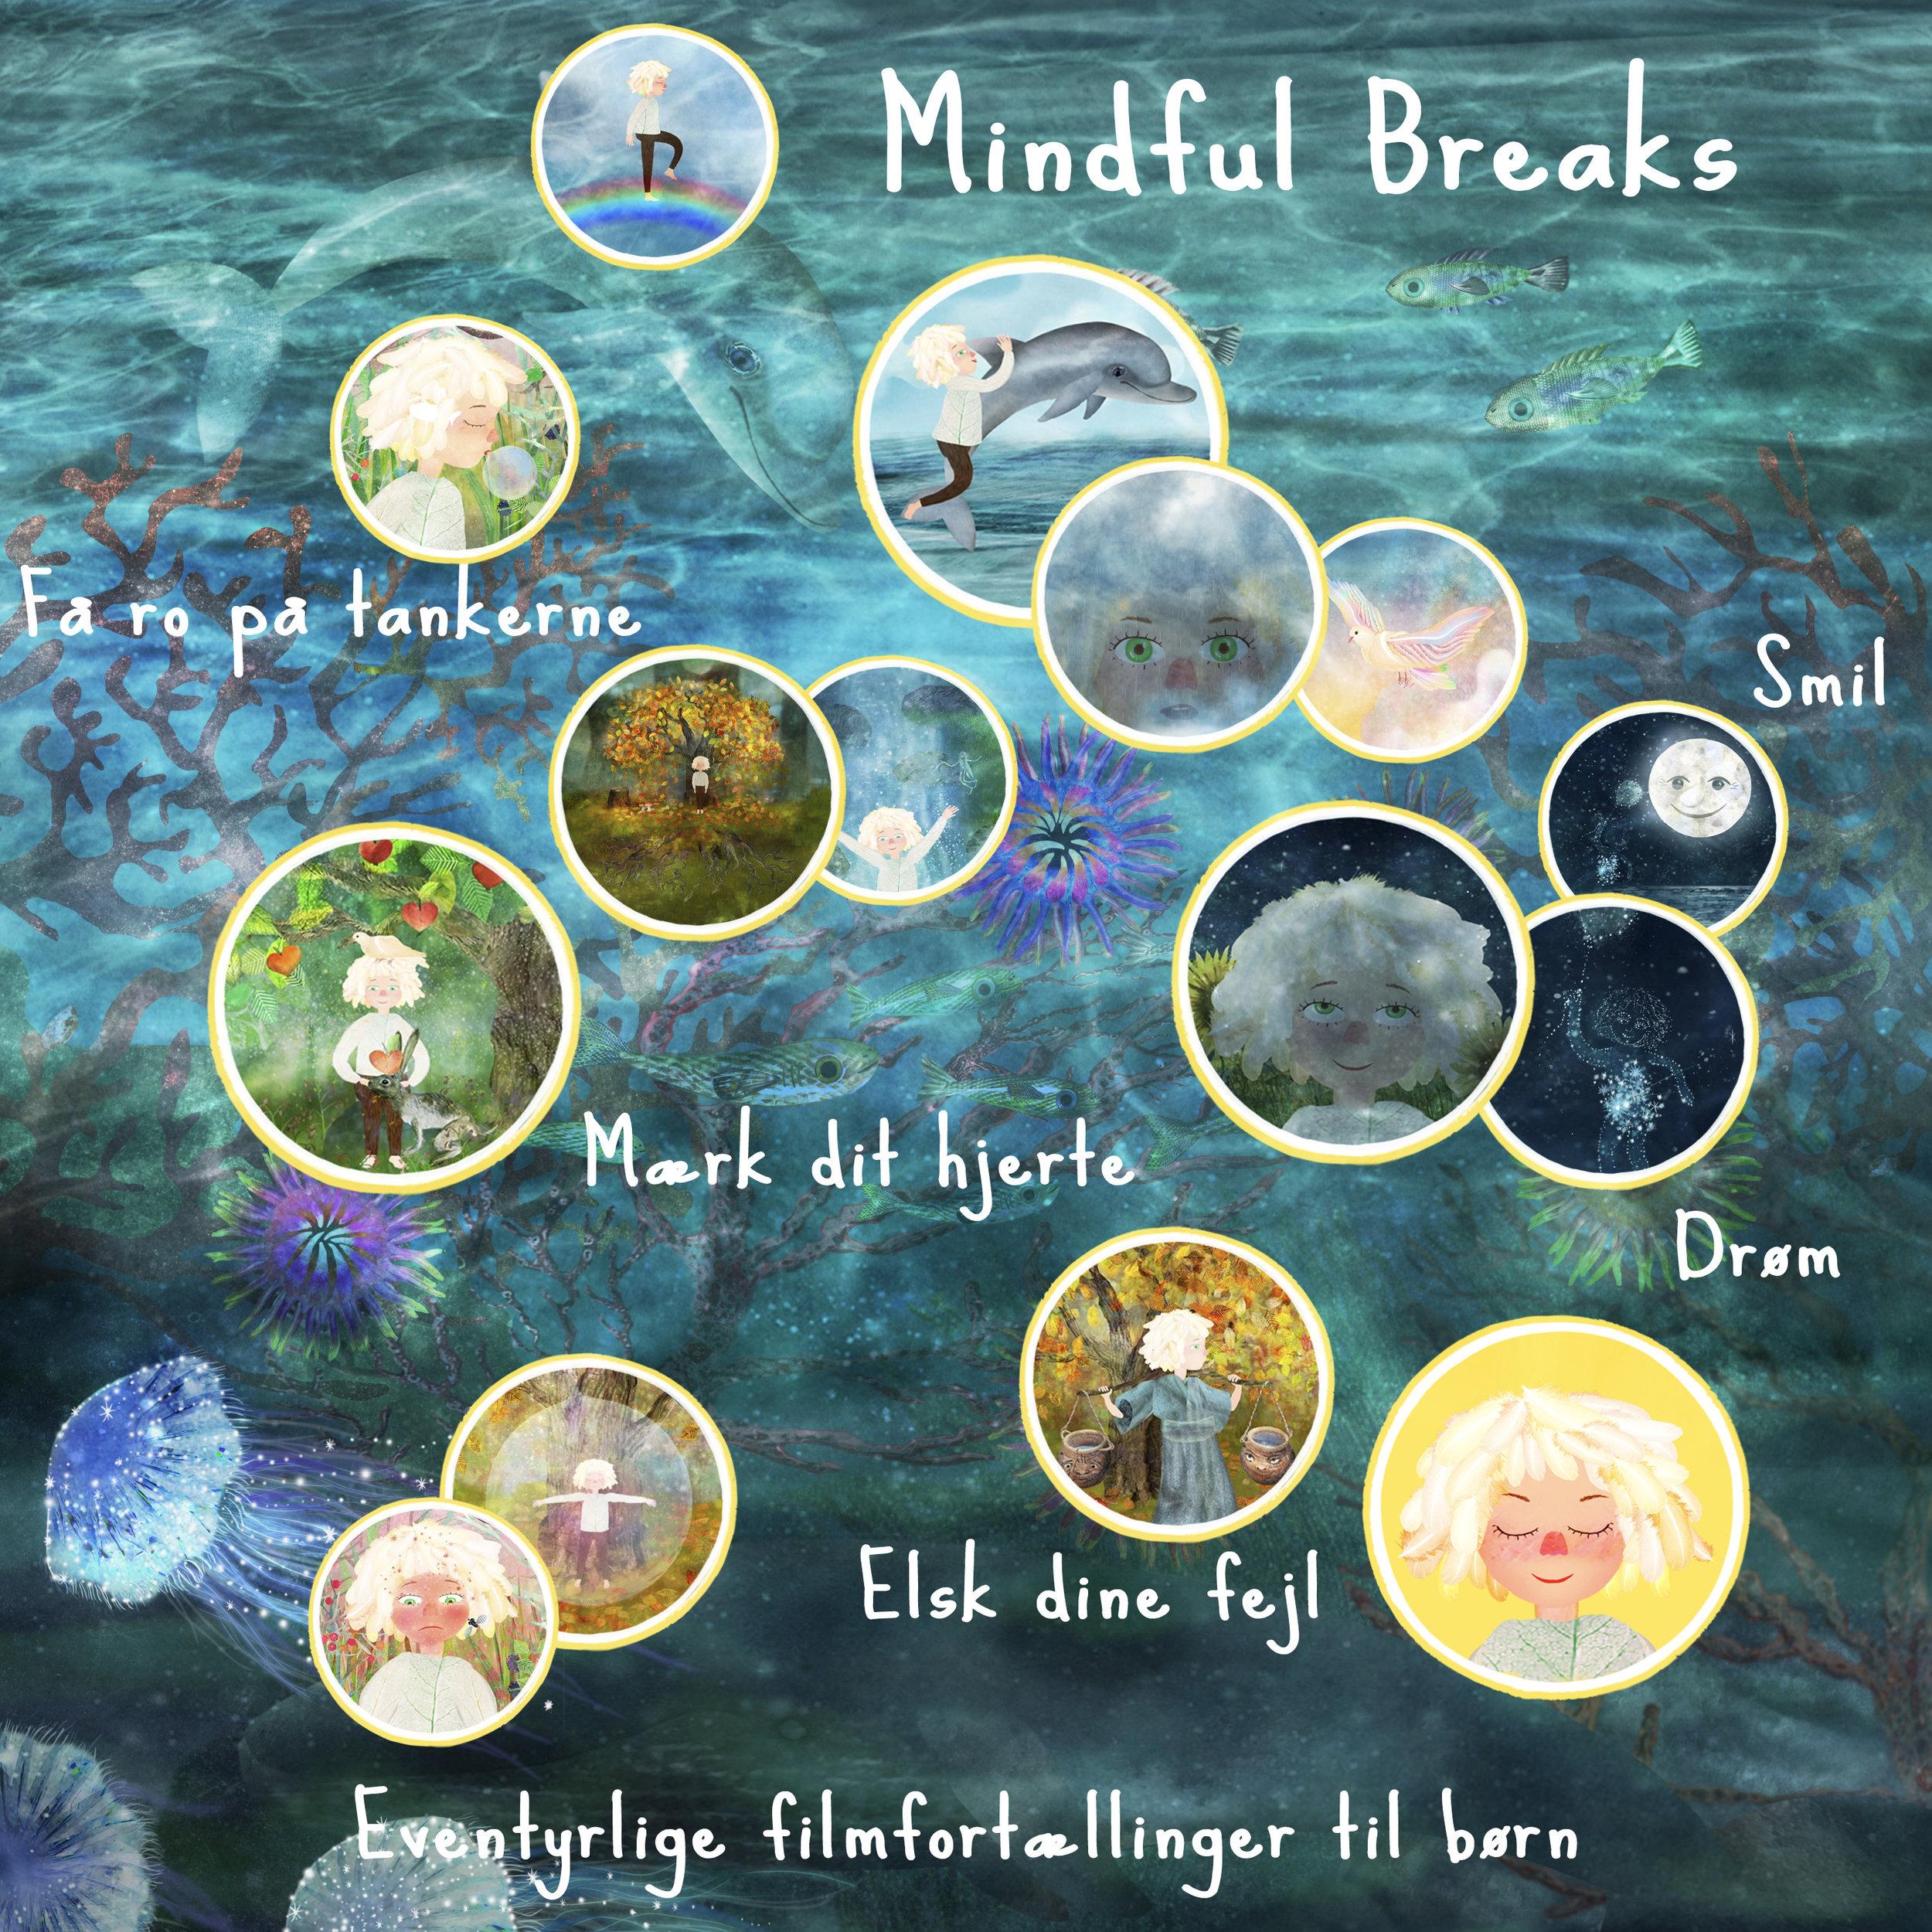 Mindful_Breaks.jpg